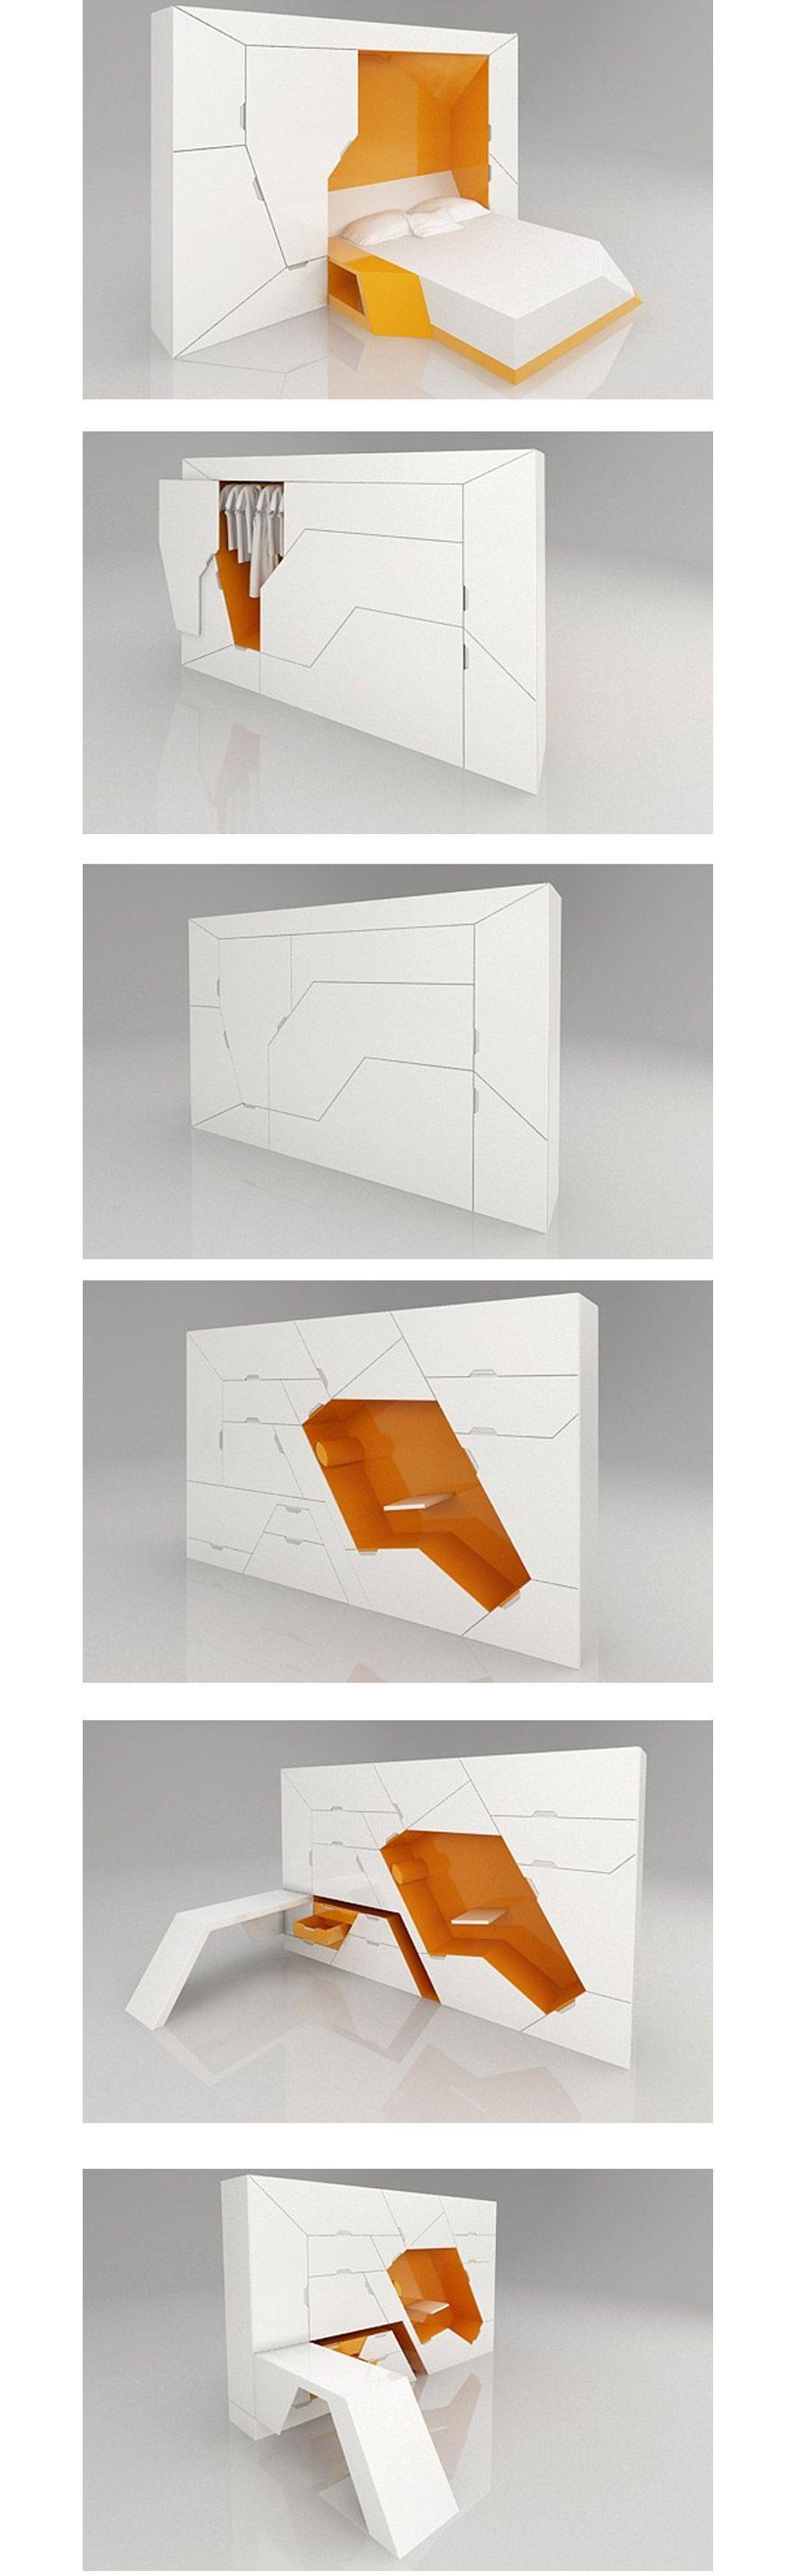 A Empresa De M Veis Modulares Boxetti Cria Solu Es De Otimiza O  # Muebles Boxetti